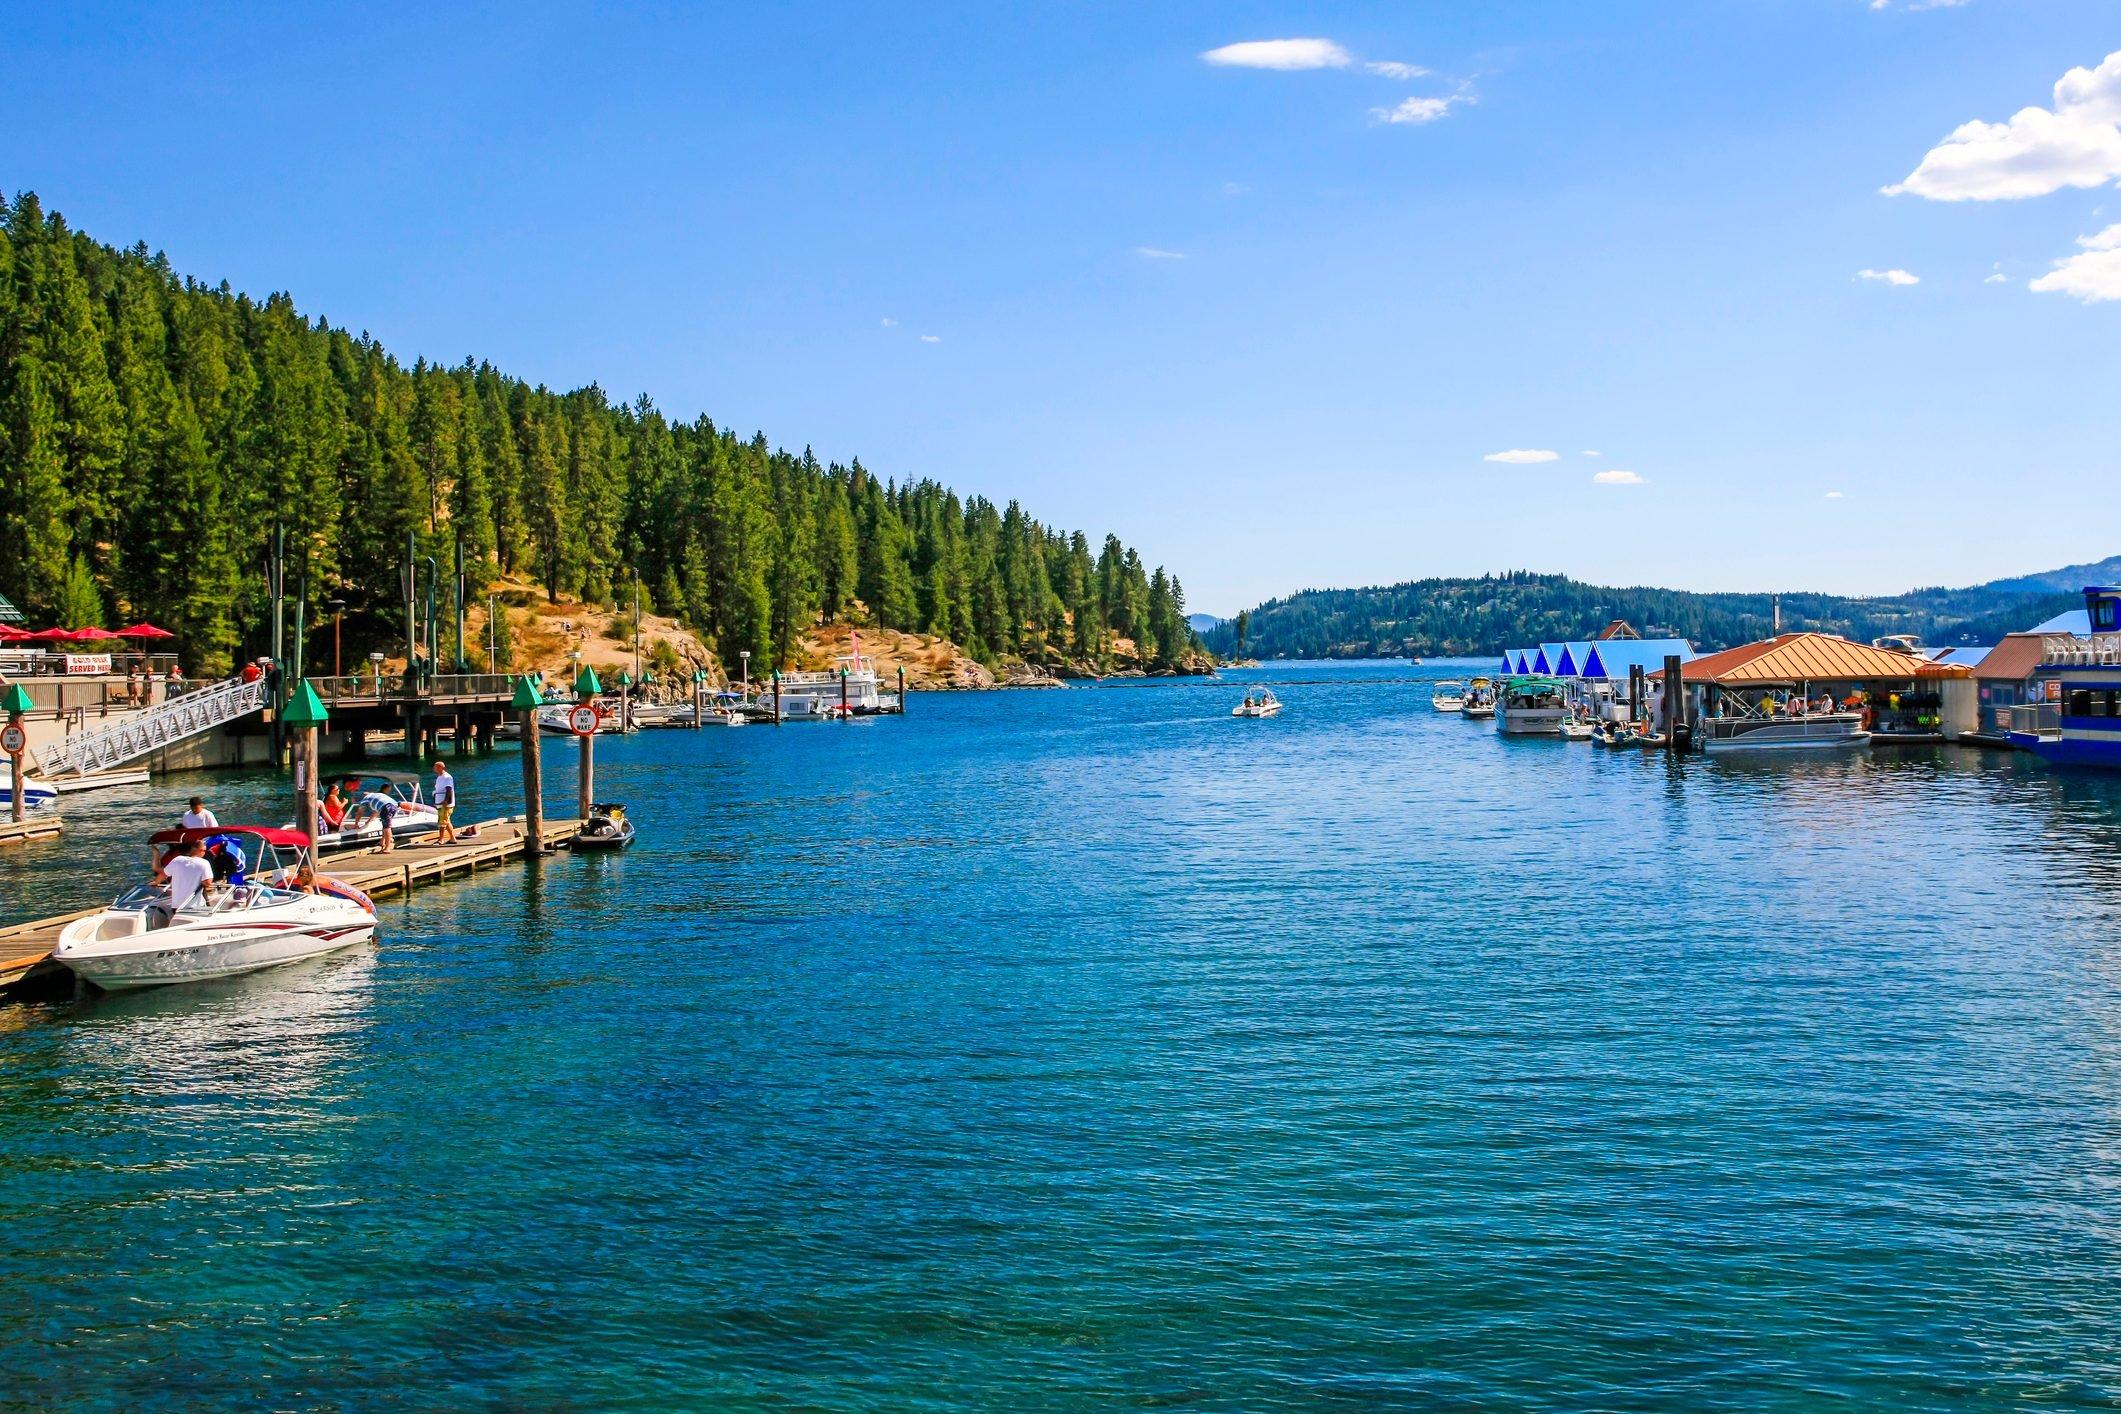 Lake Coeur d'Alene in Idaho